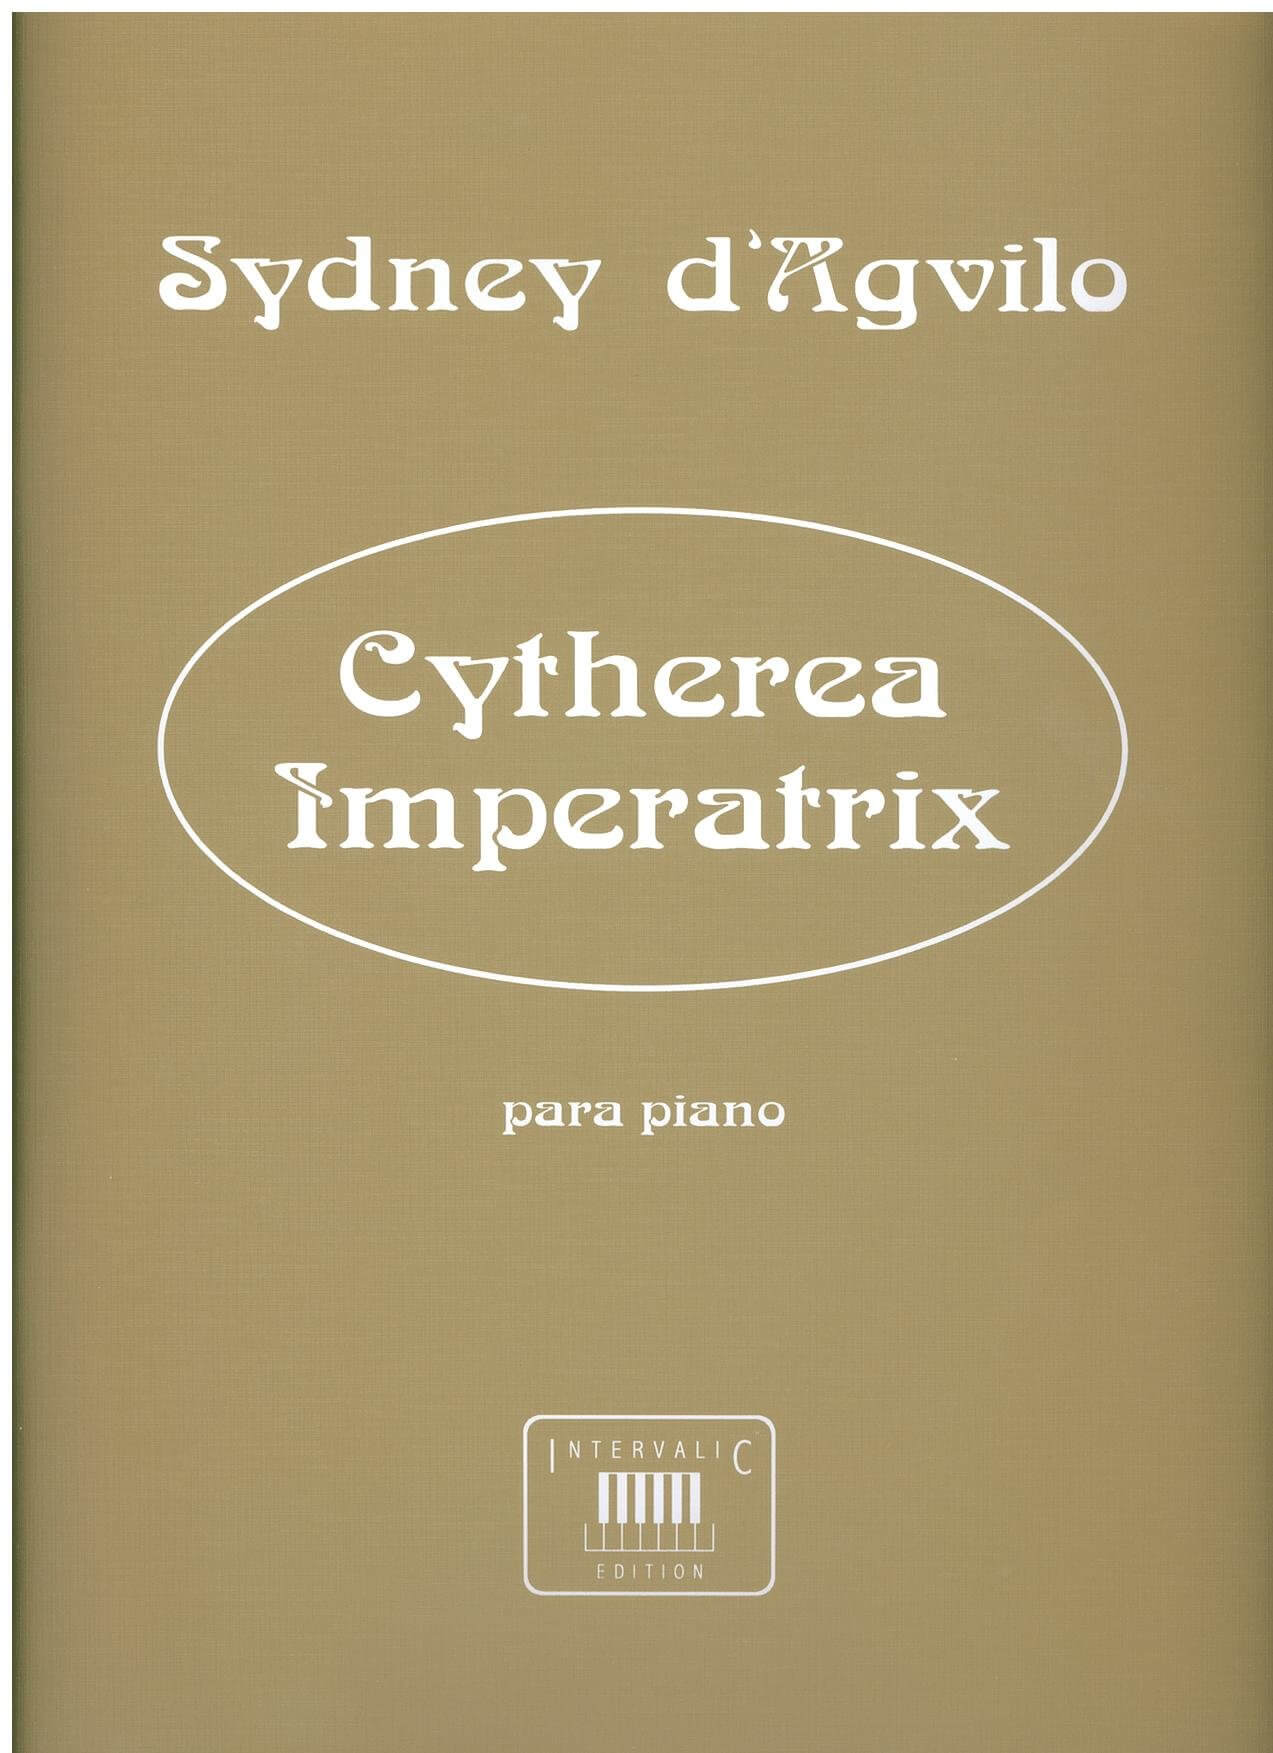 Cytherea Imperatrix. Piano.D'Agvillo